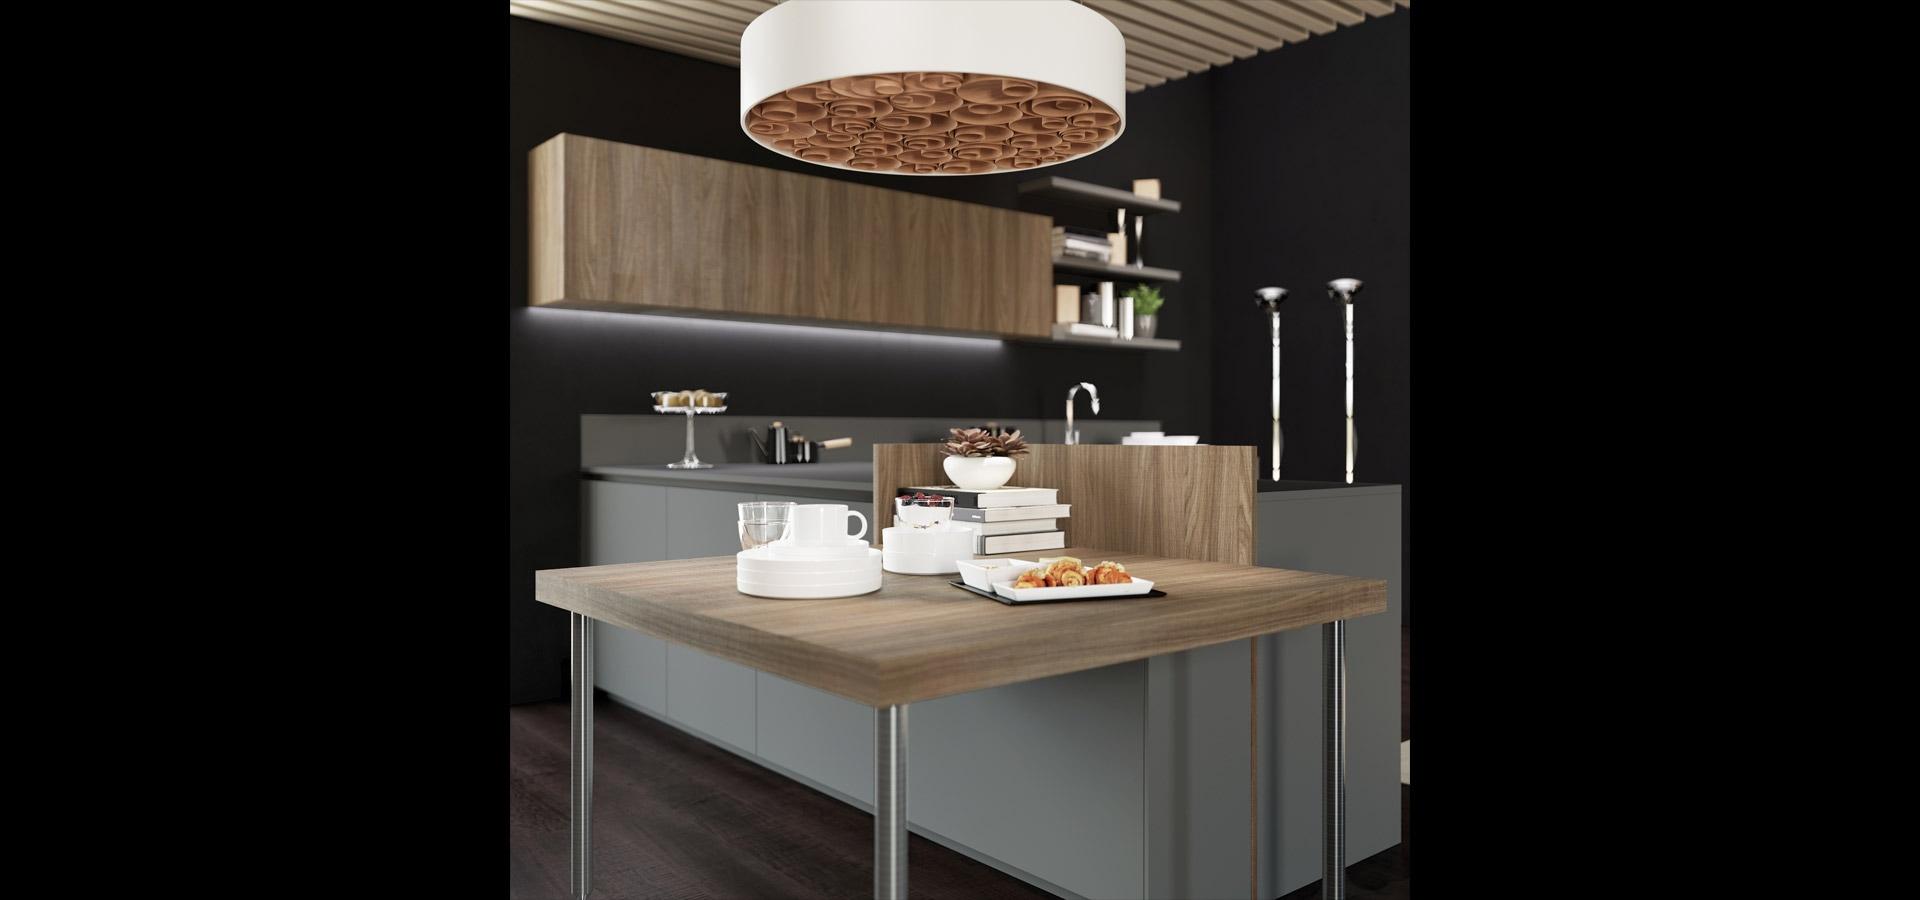 Cucina contemporanea in bilaminato legno | Ménta_06 | MITON Cucine